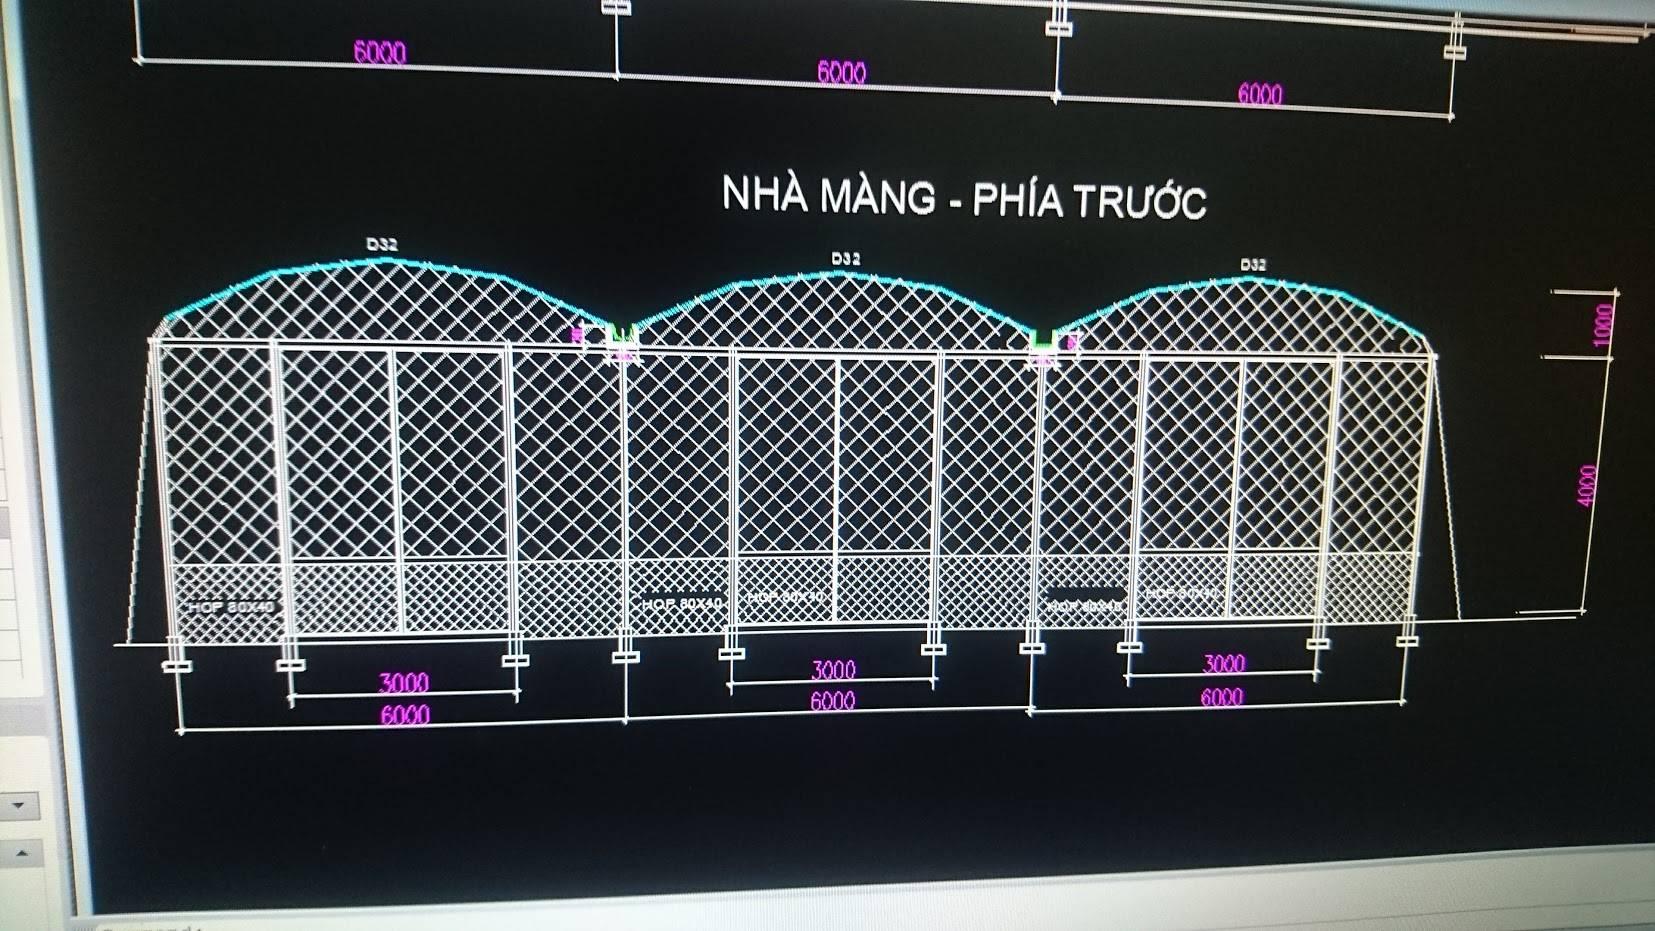 nha-mang-mt-6m-jpg.13737